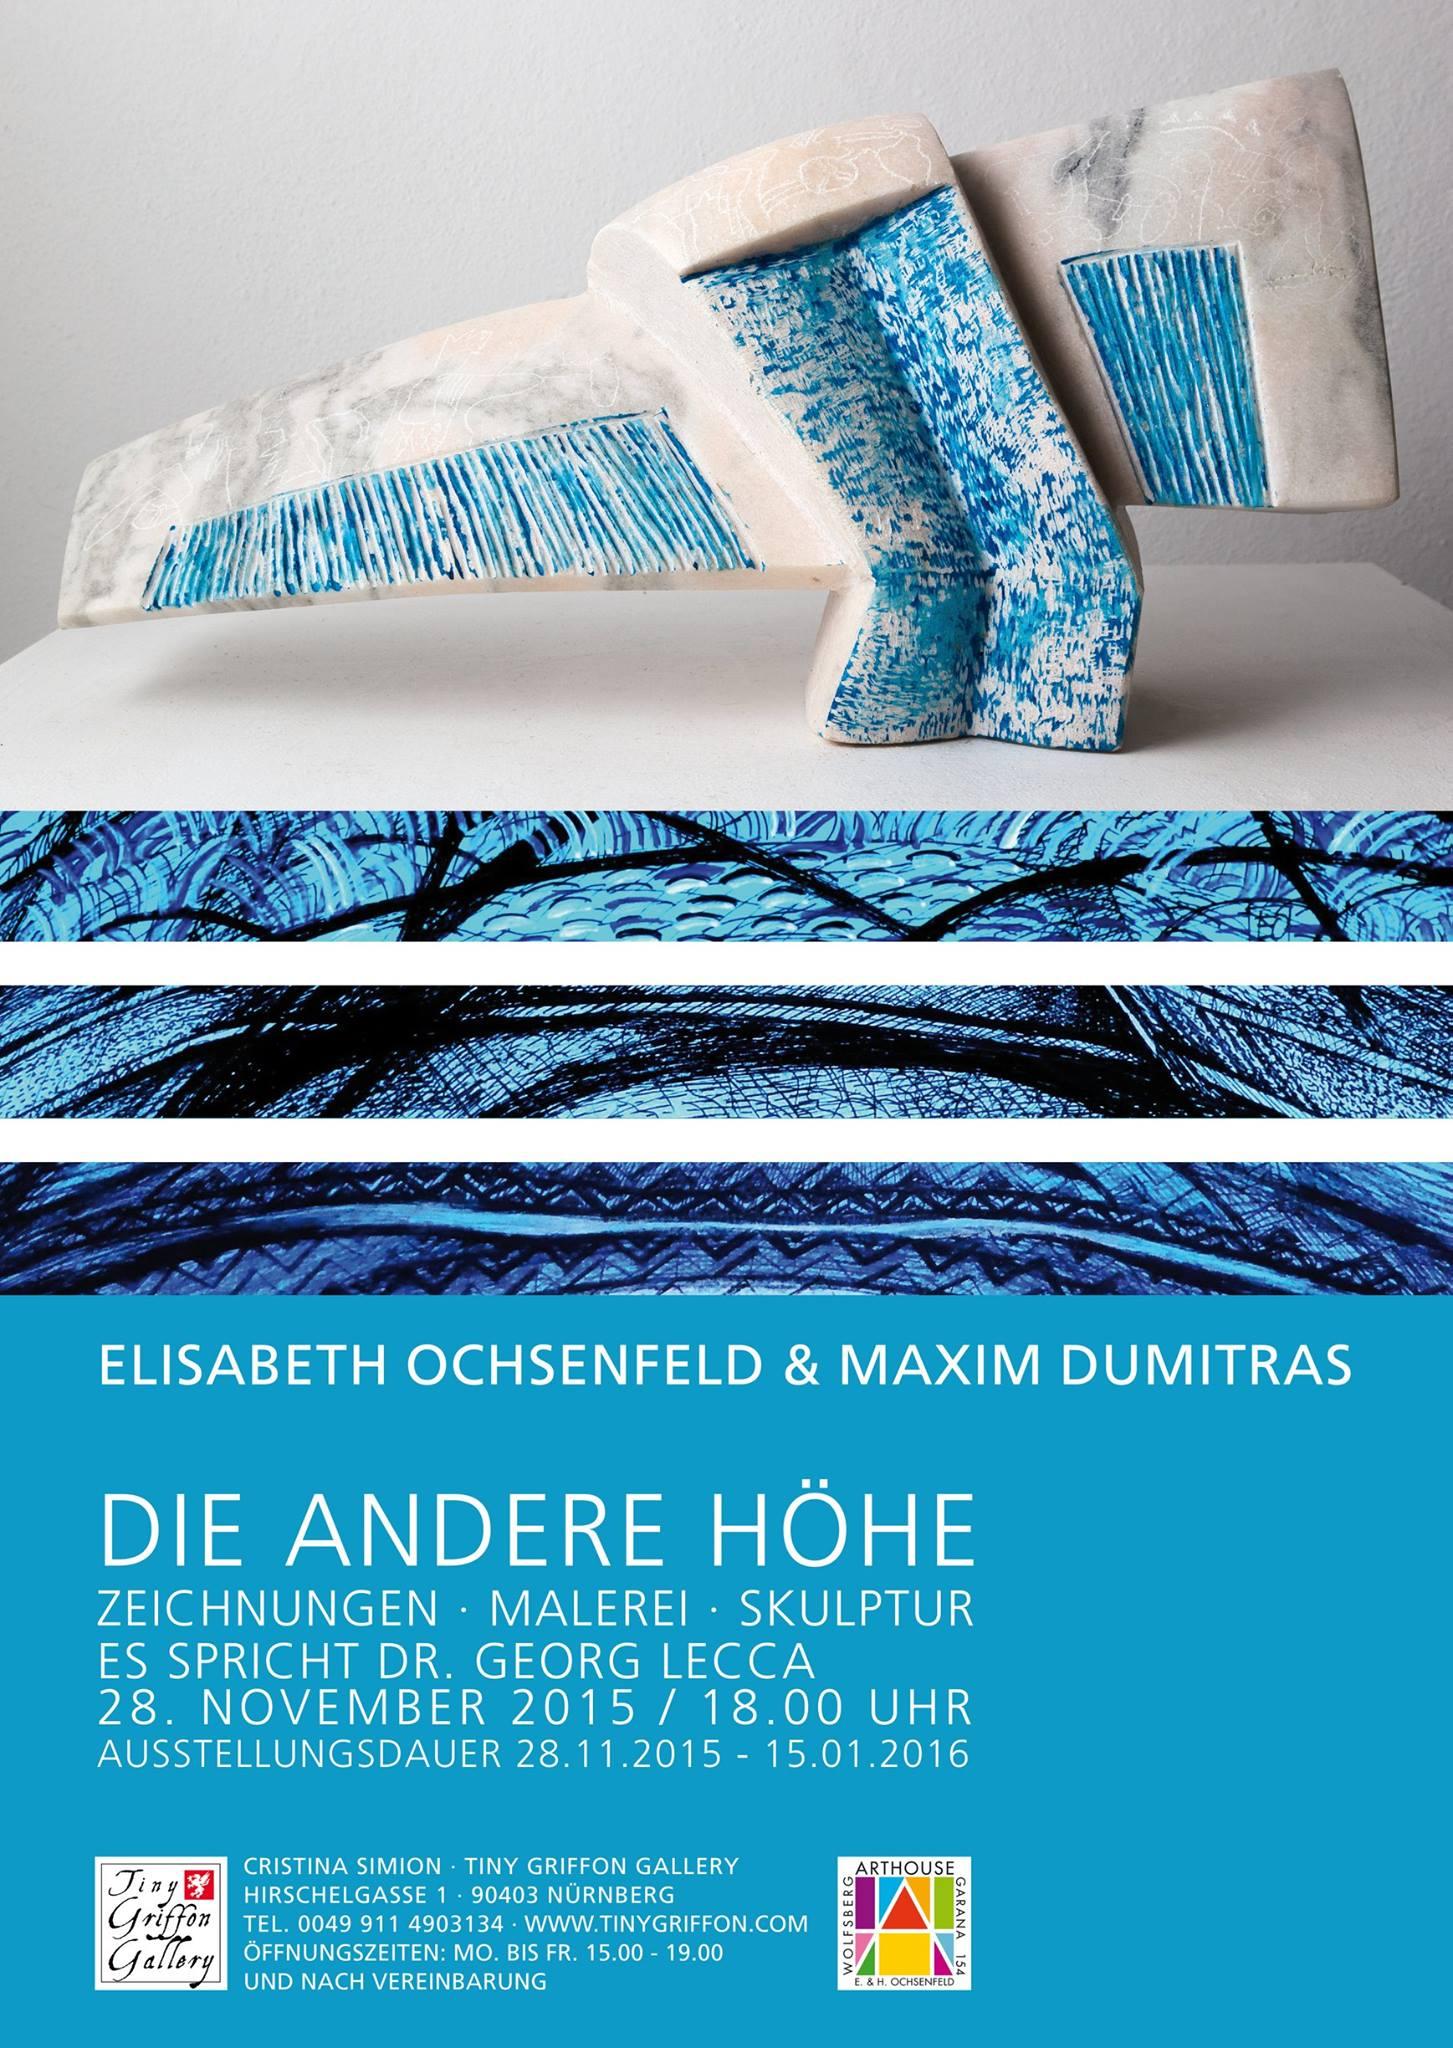 "Elisabeth Ochsenfeld și Maxim Dumitraș ""Cealaltă Înălțime"" @ Tiny Griffon Gallery, Germania"